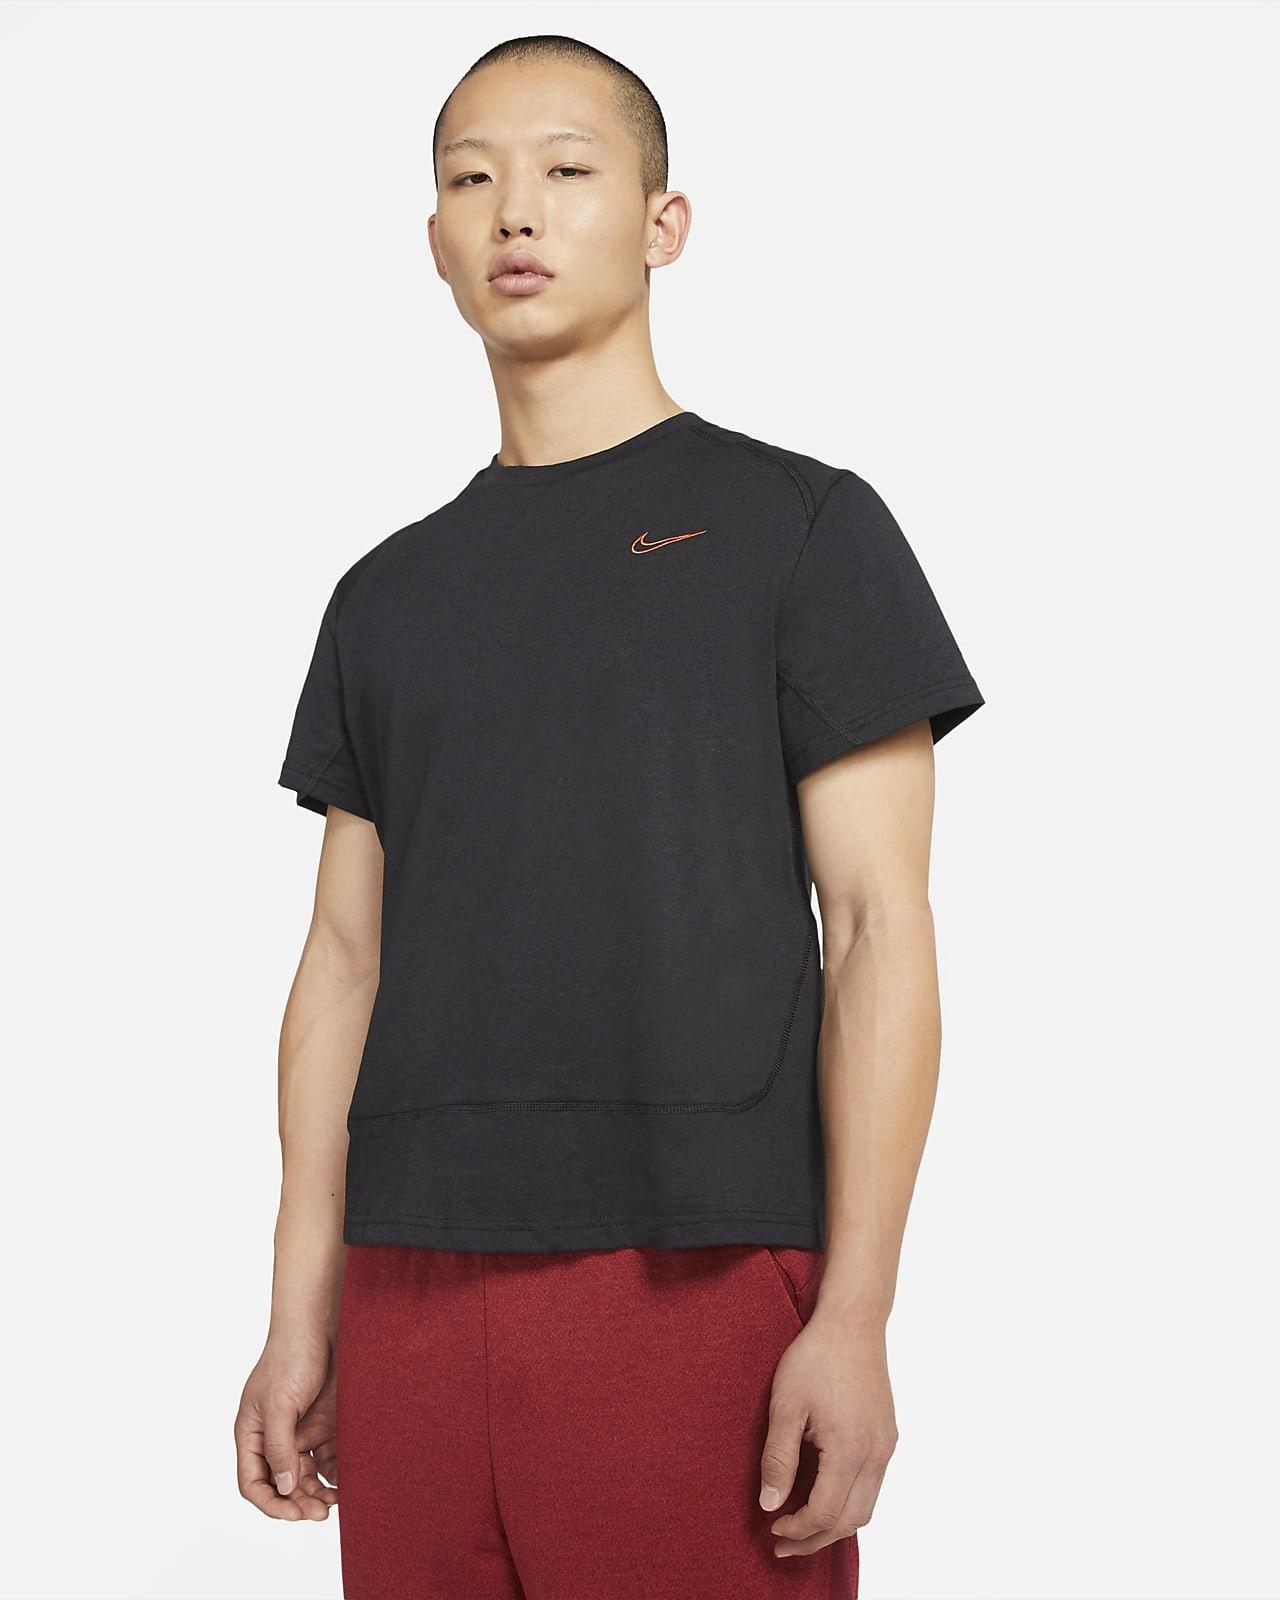 Nike Men's Short-Sleeve Training Top